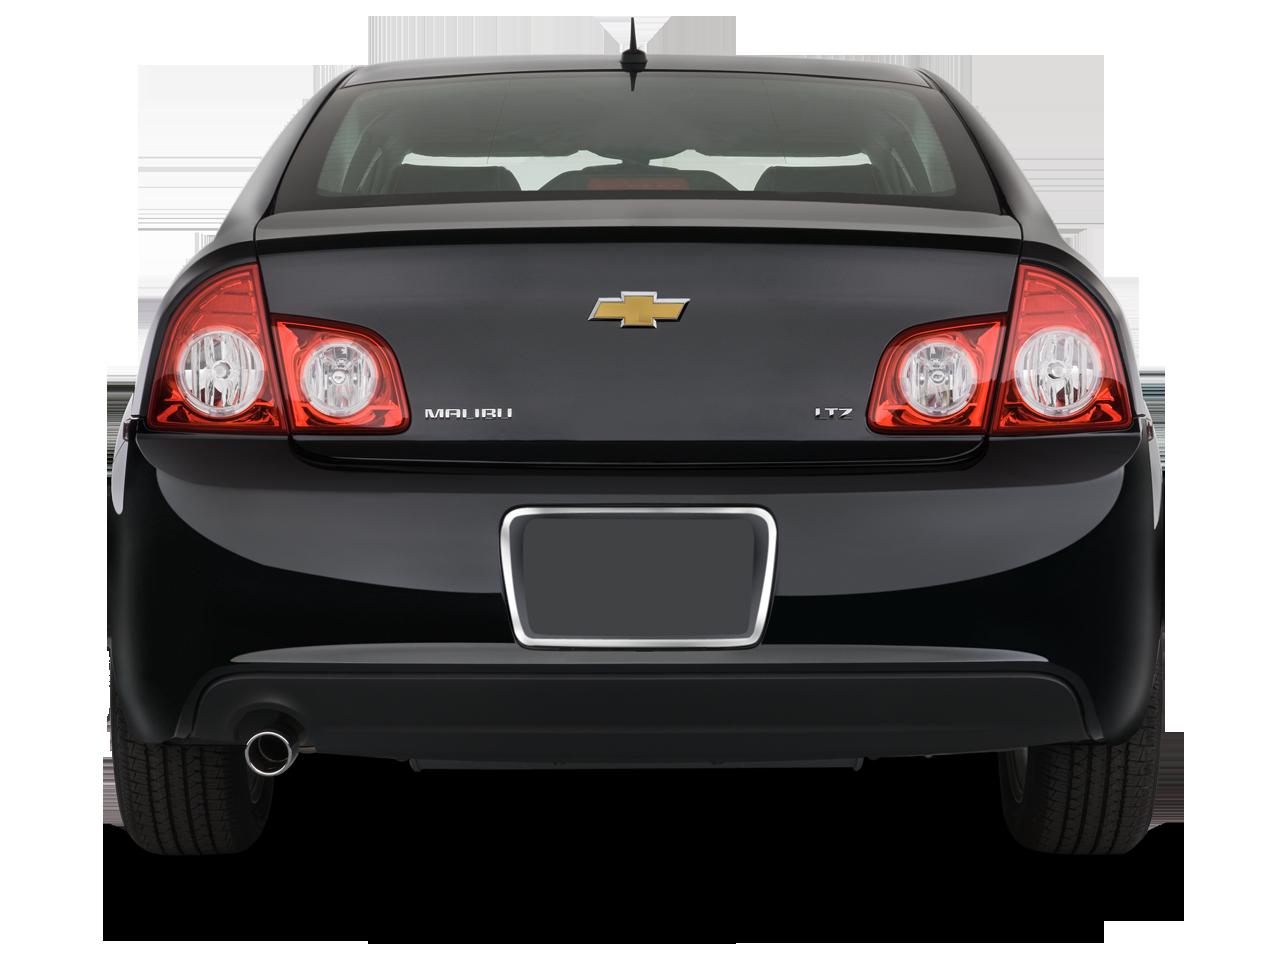 2009 chevy malibu ltz fuel efficient news car features and reviews automobile magazine. Black Bedroom Furniture Sets. Home Design Ideas